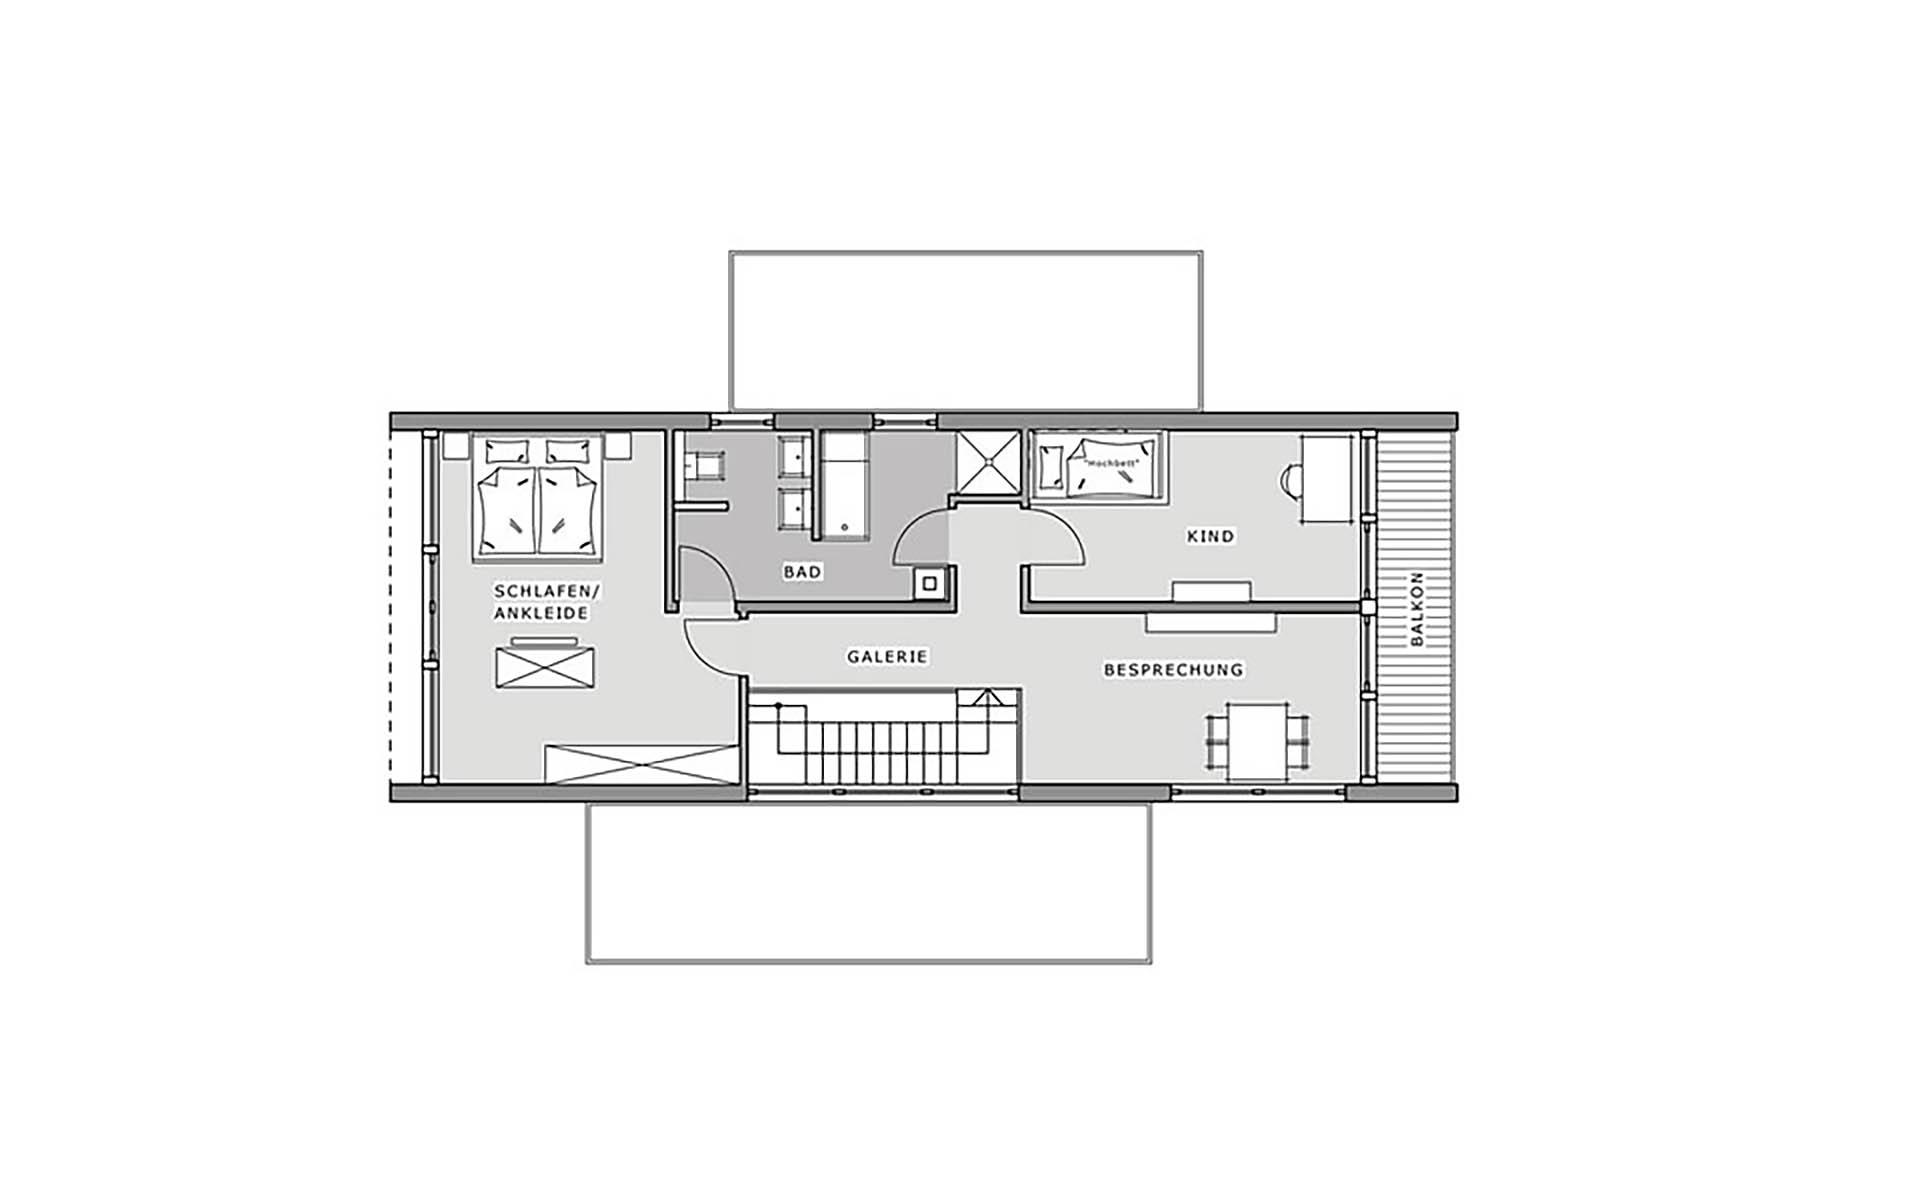 Obergeschoss Box - Musterhaus Hameln von Meisterstück-HAUS